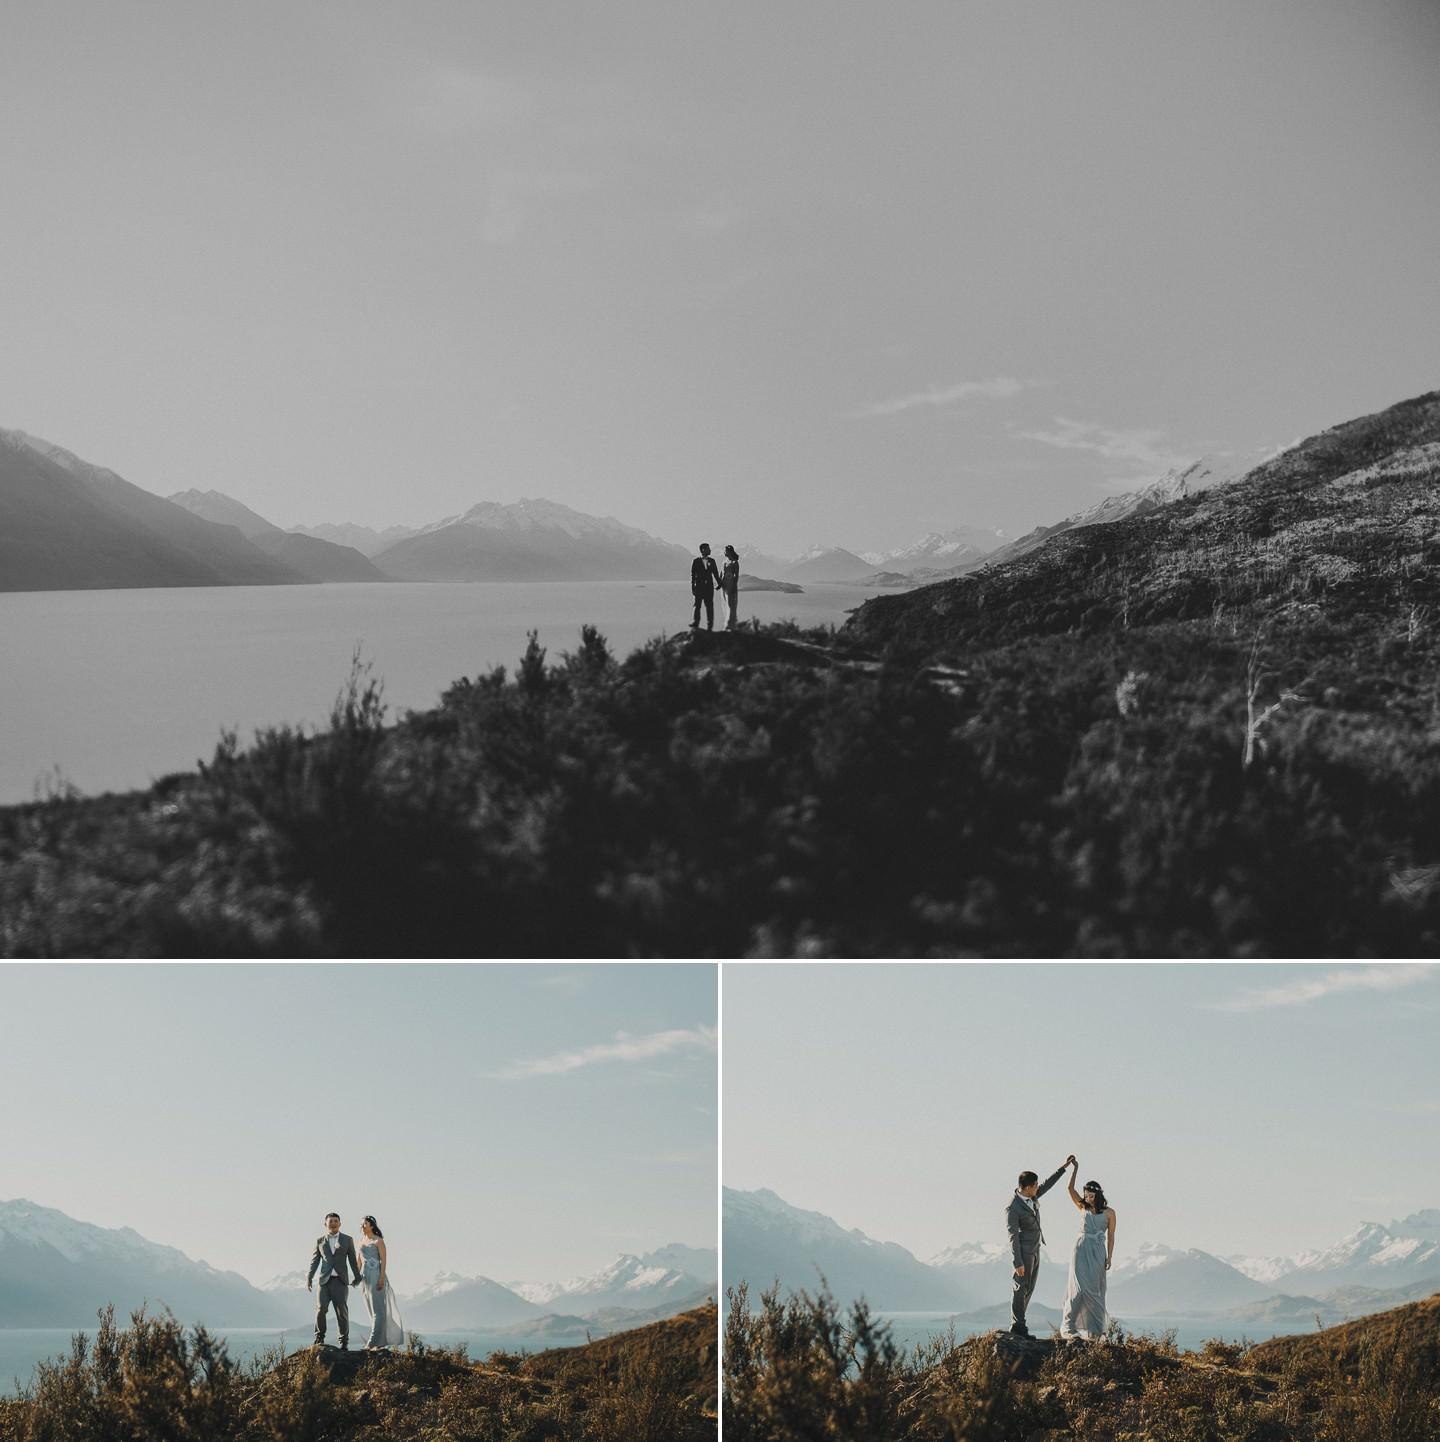 Wedding photography above Lake Wakatipu